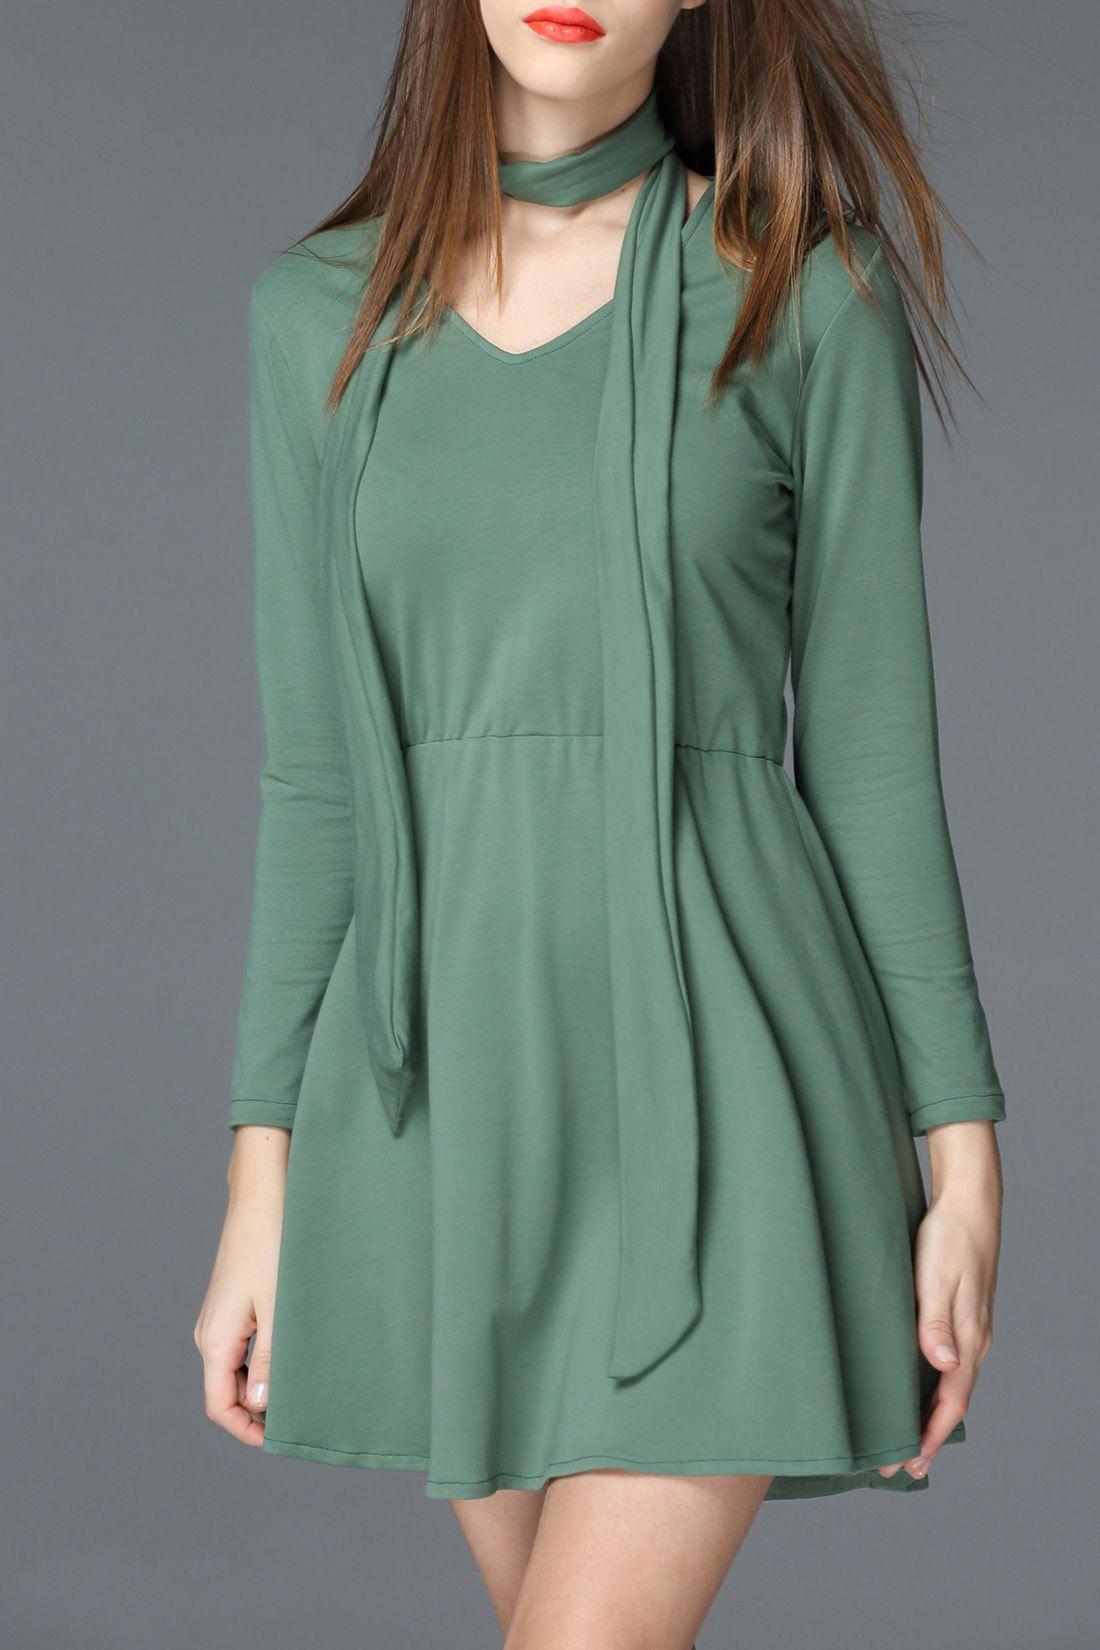 Oserjep Pea Green Tie Design Solid Color Dress | Mini Dresses at ...